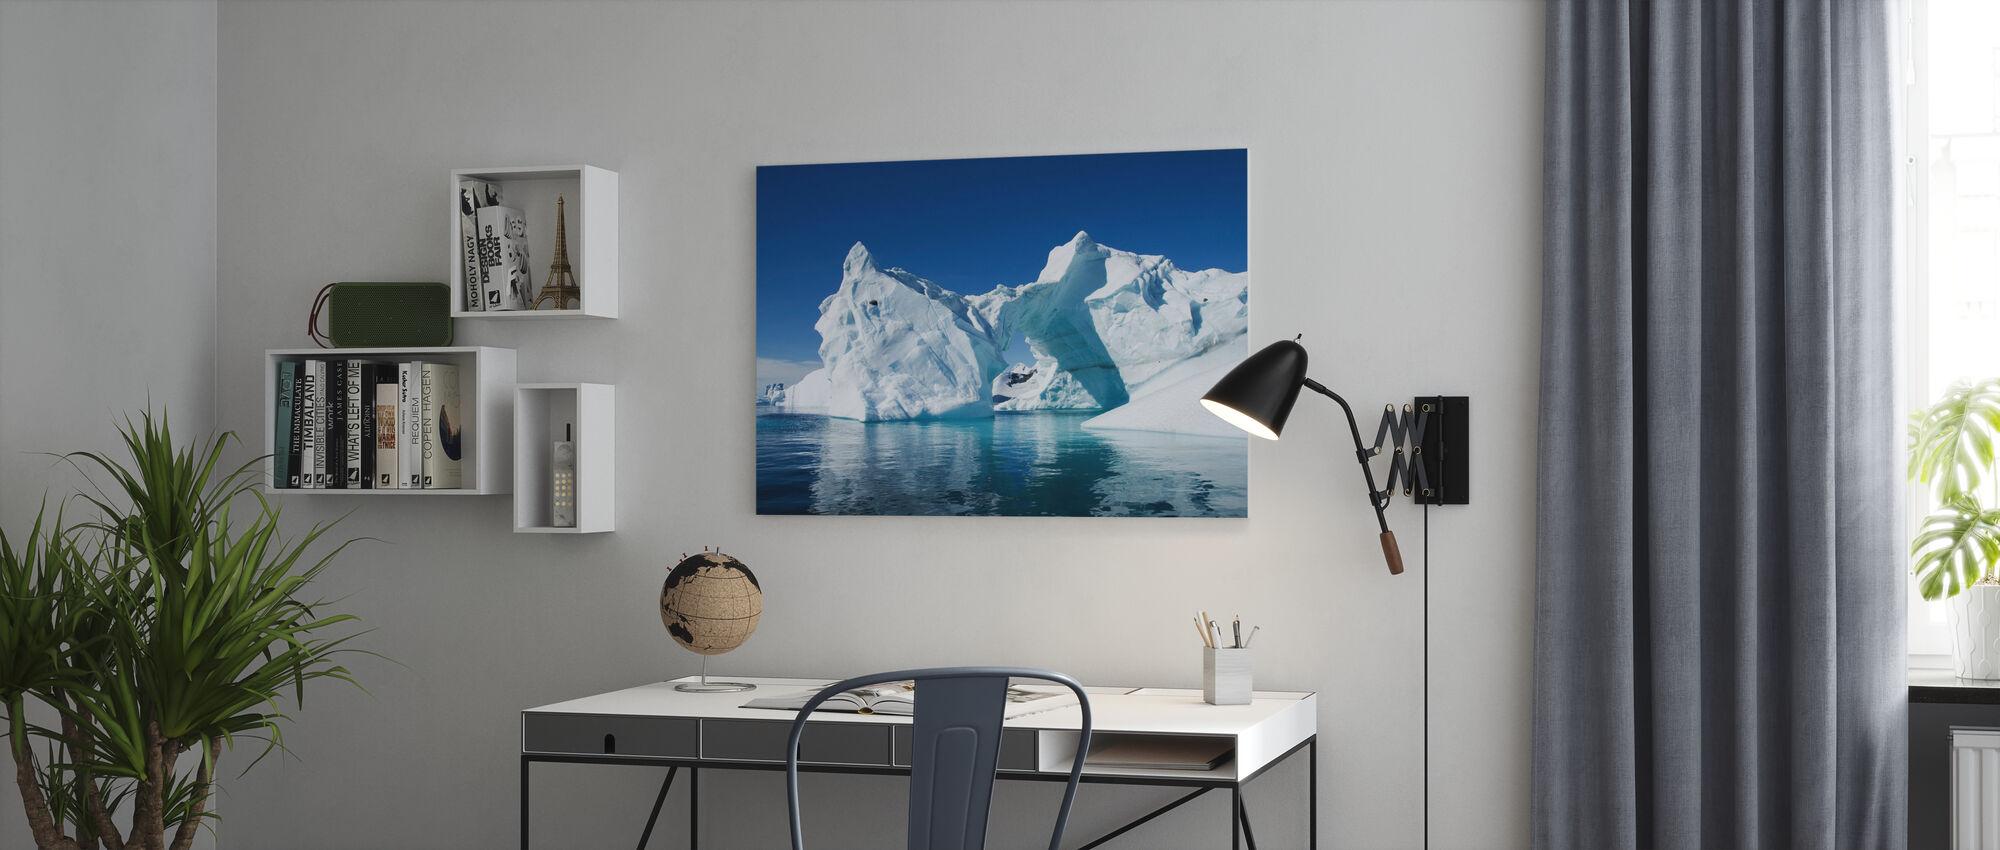 Iceberg Antarctica - Canvas print - Office